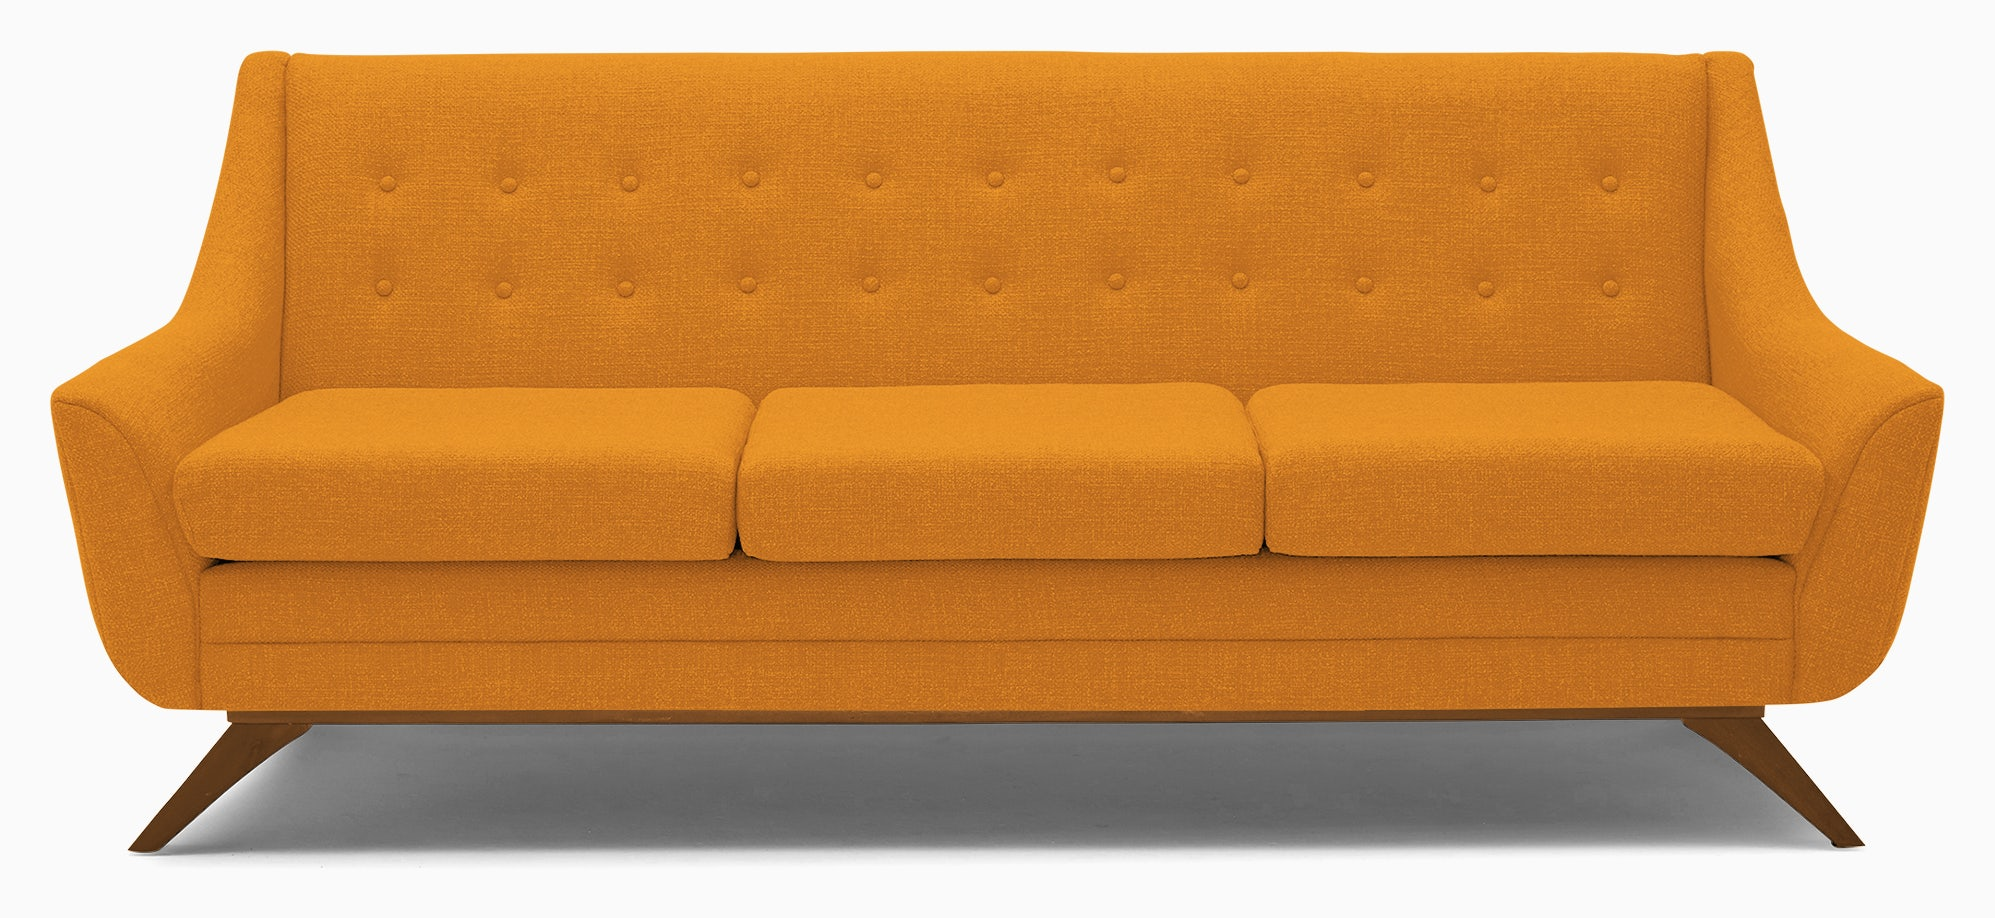 aubrey sofa cordova amber